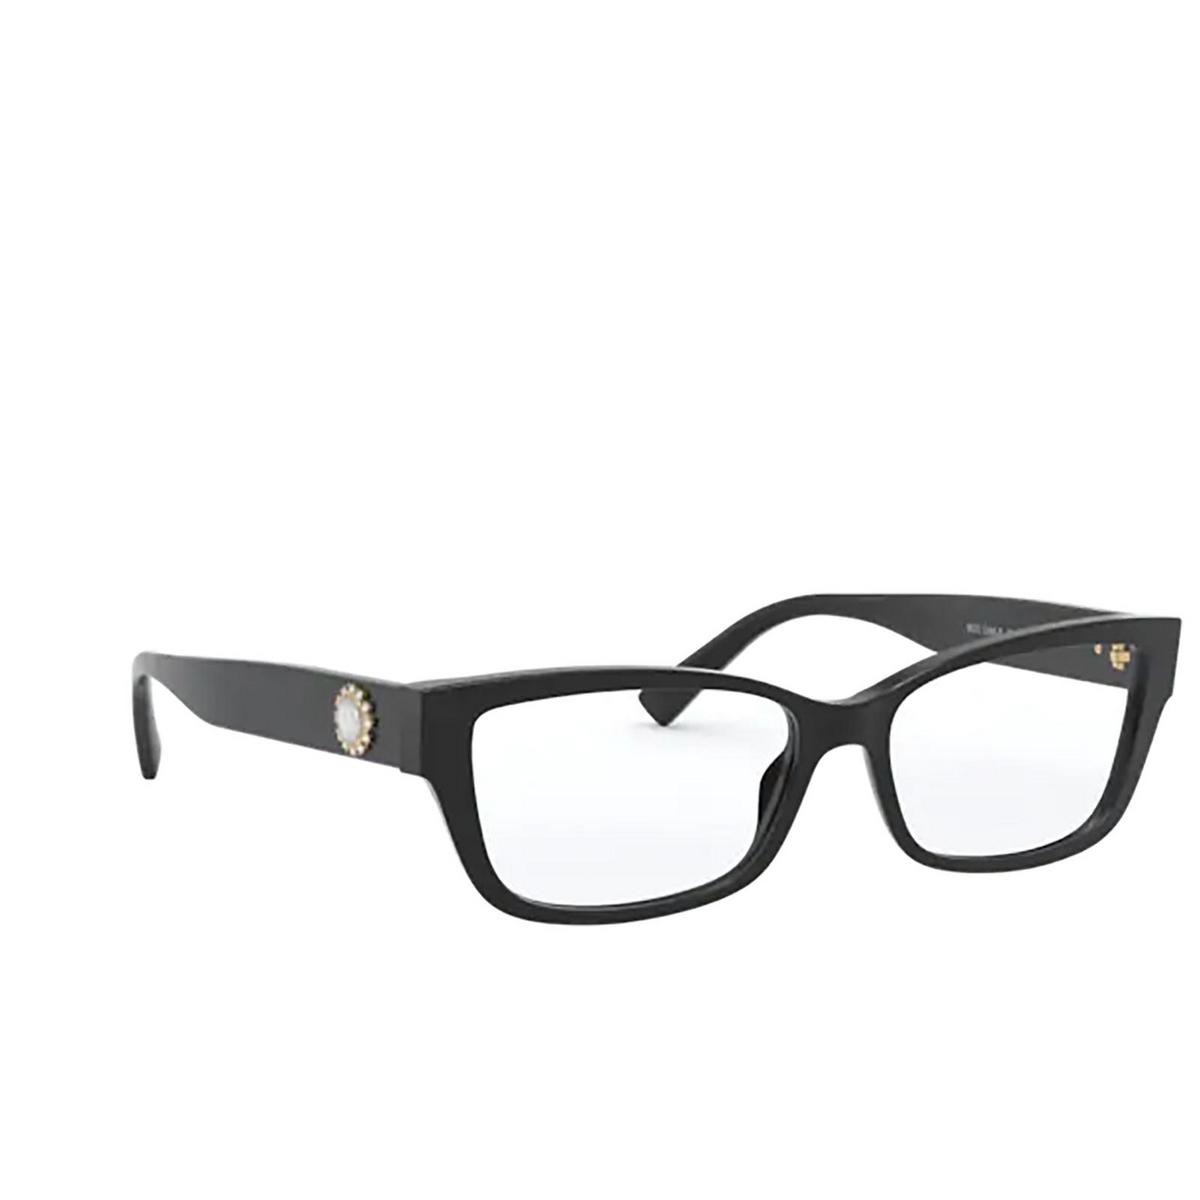 Versace® Rectangle Eyeglasses: VE3284B color Black GB1 - three-quarters view.